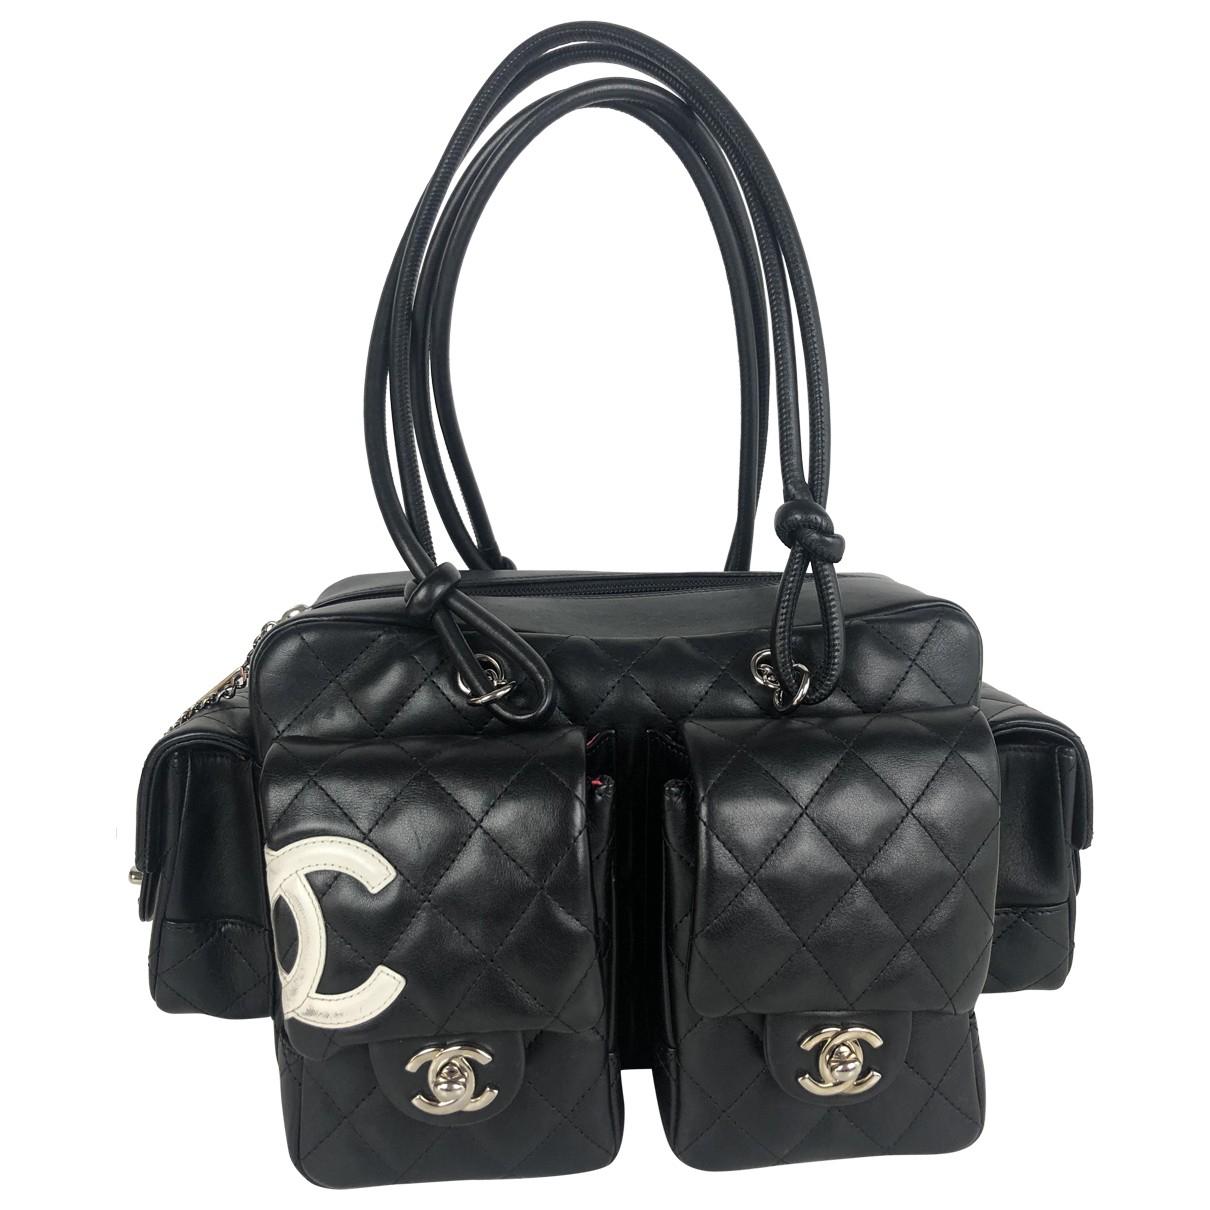 Chanel Cambon Black Leather handbag for Women N